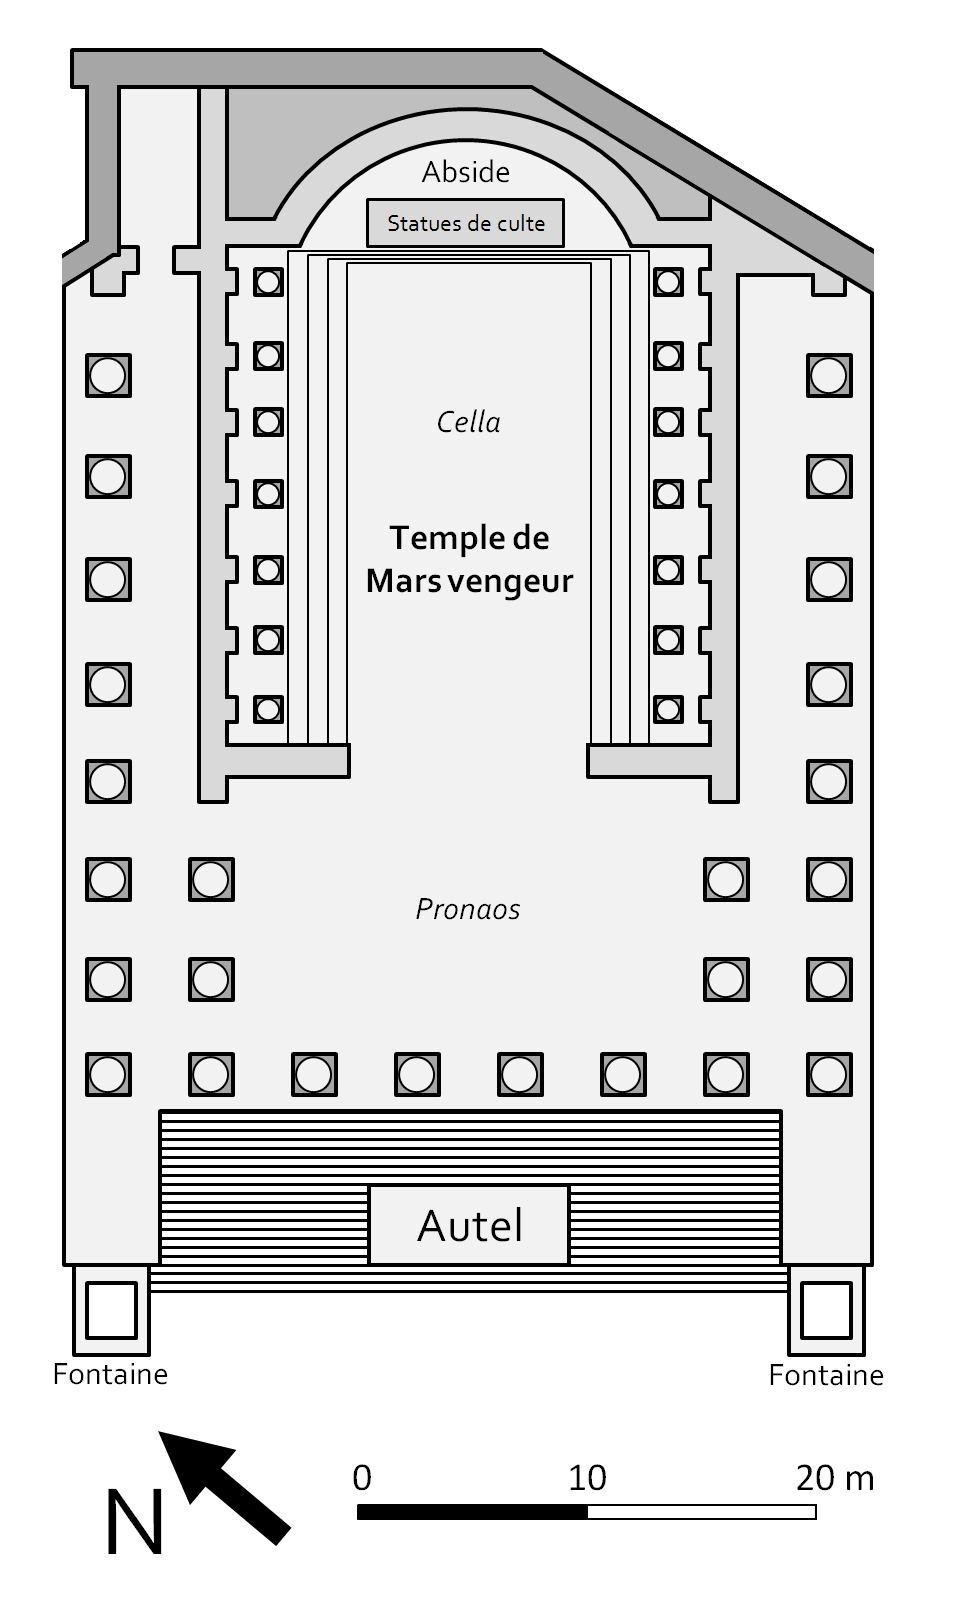 file temple mars vengeur plan png wikimedia commons file temple mars vengeur plan png